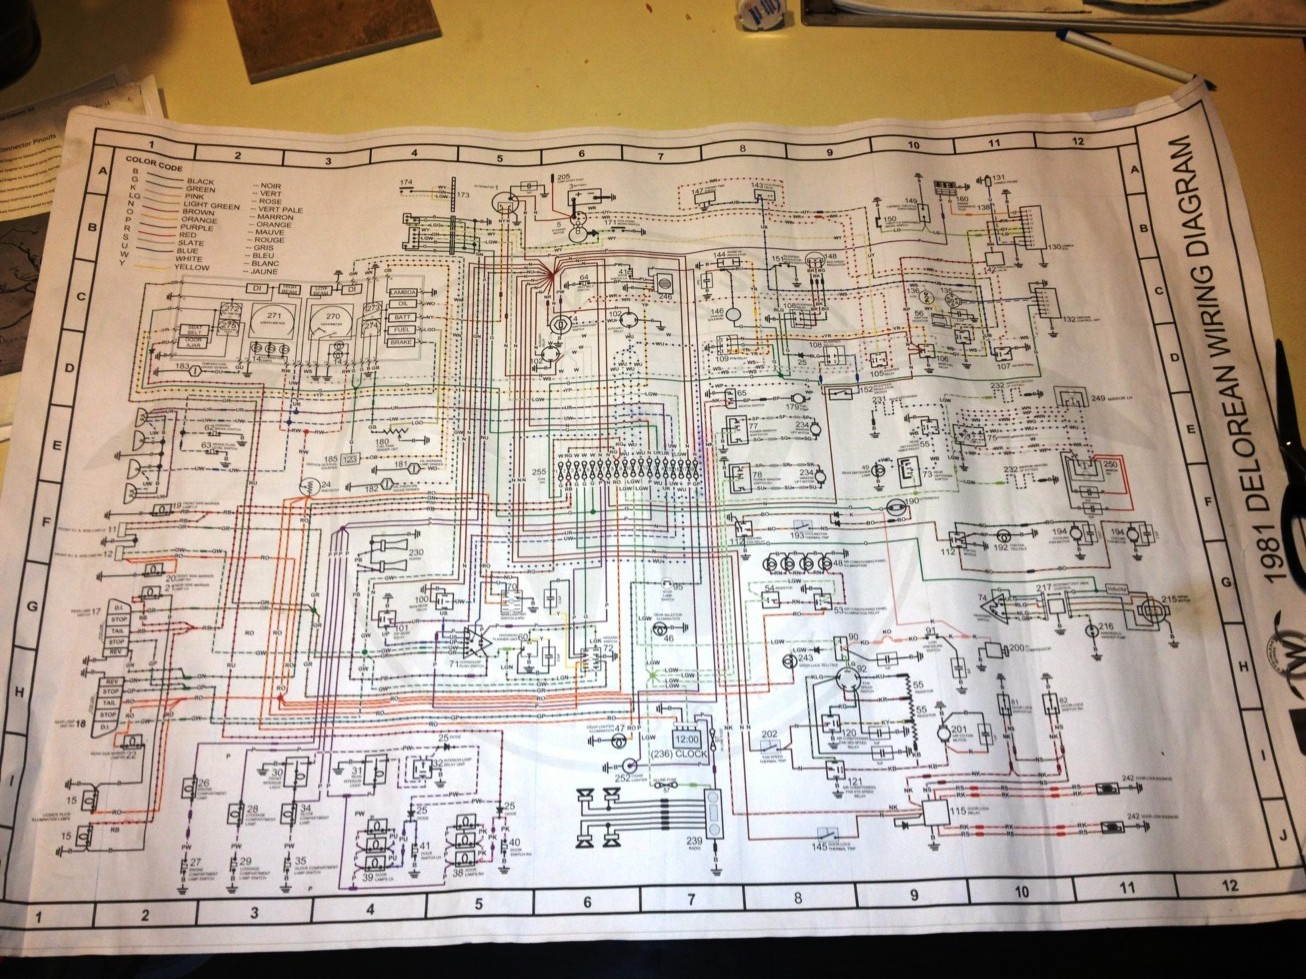 hight resolution of delorean wiring diagrams images gallery ls1 delorean may 2012 rh ls1delorean com